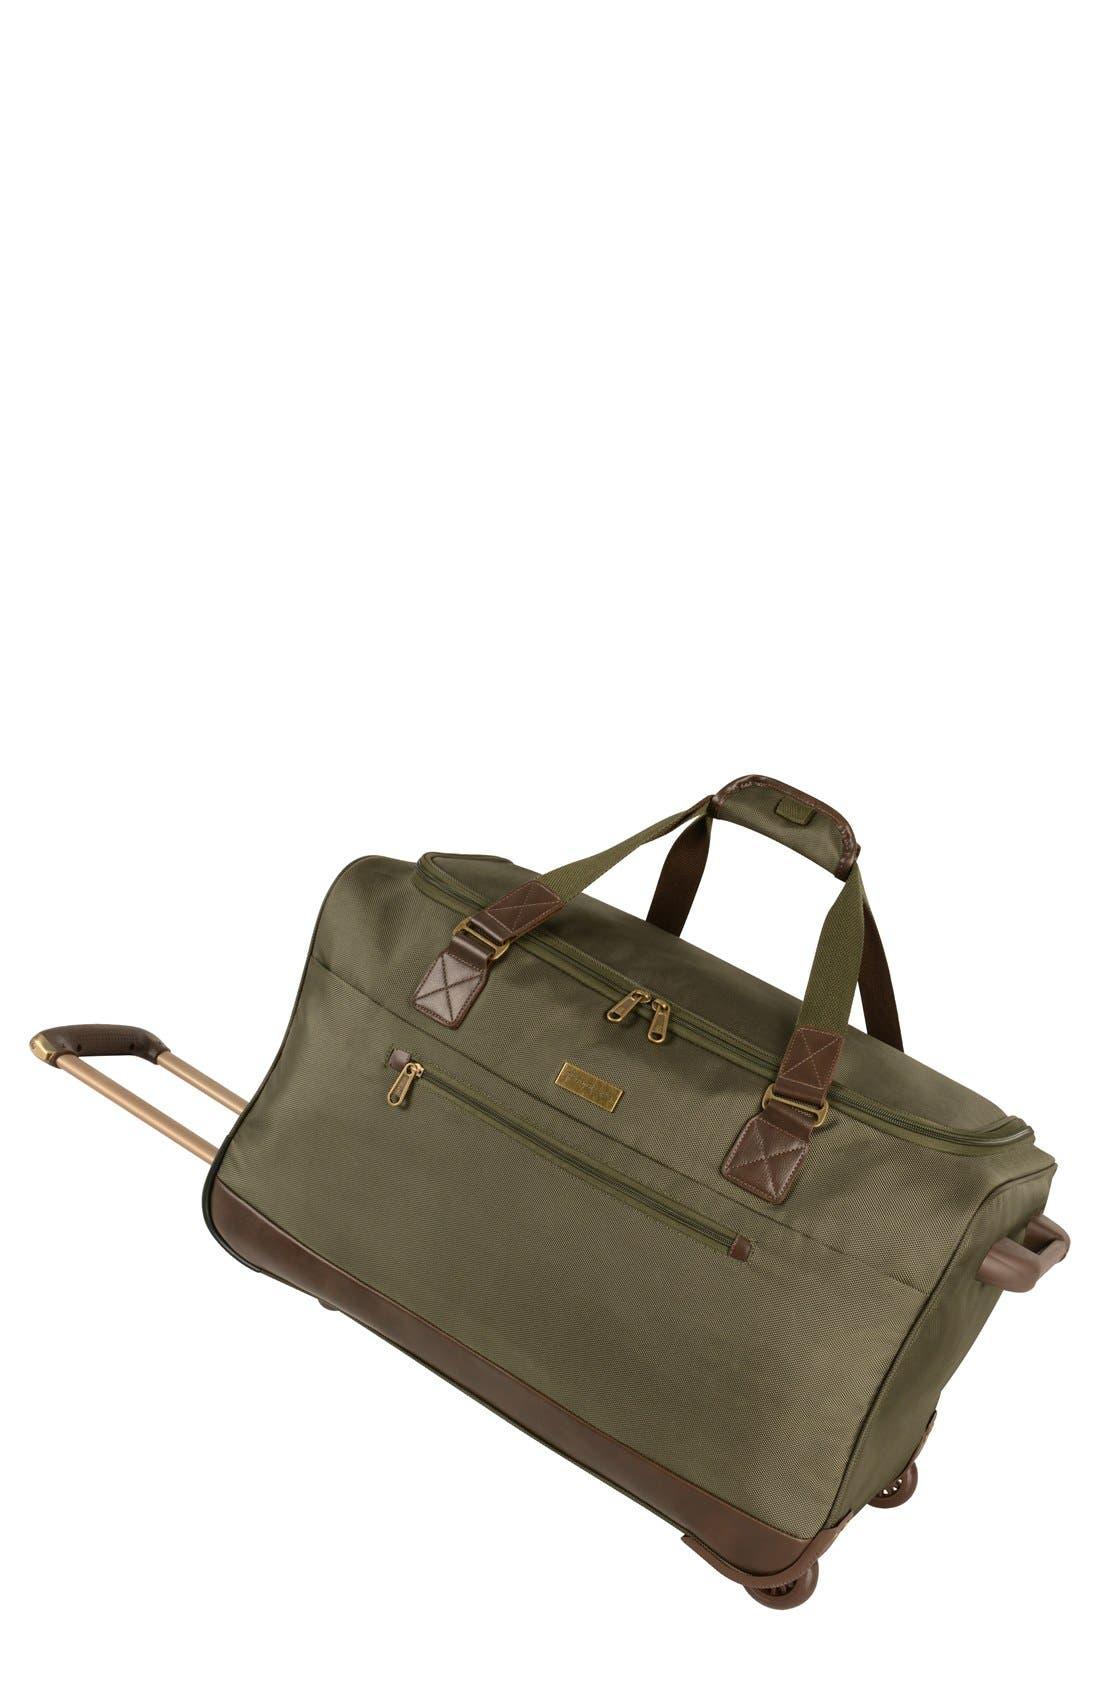 Main Image - Tommy Bahama 'Surge' Wheeled Duffel Bag (27 Inch)